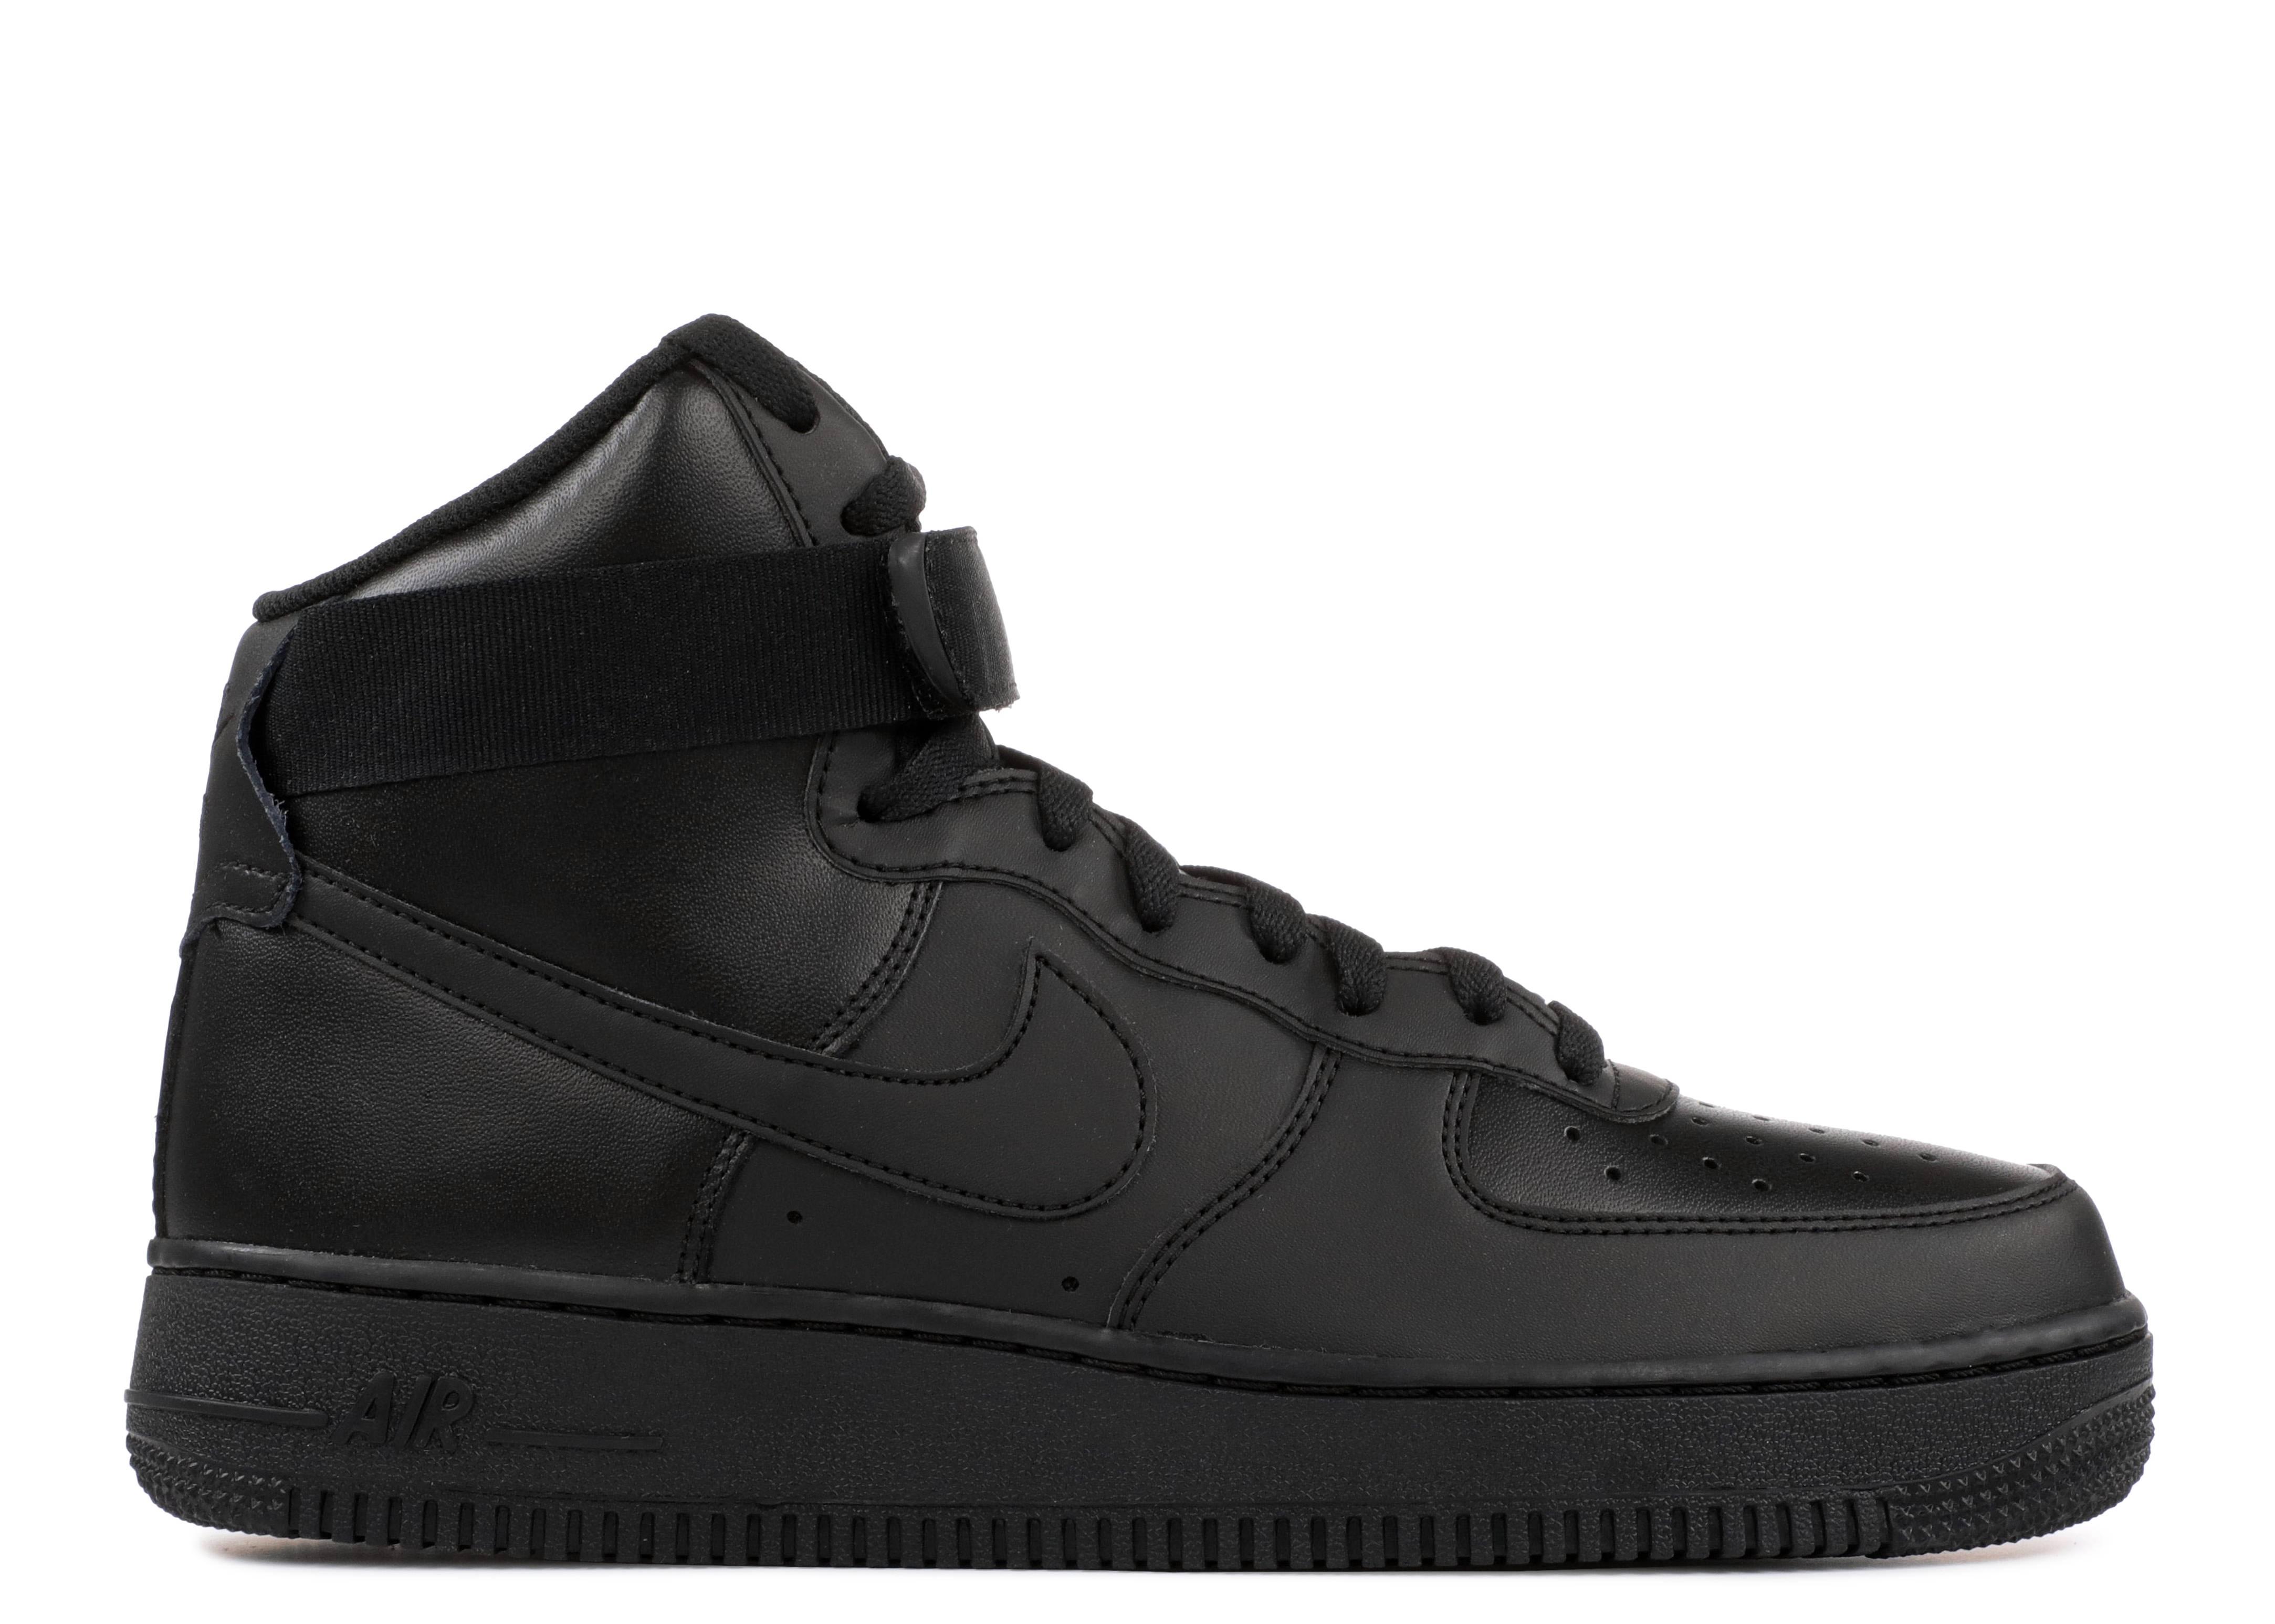 Air Force 1 High 07 Triple Black Nike 315121 032 Black